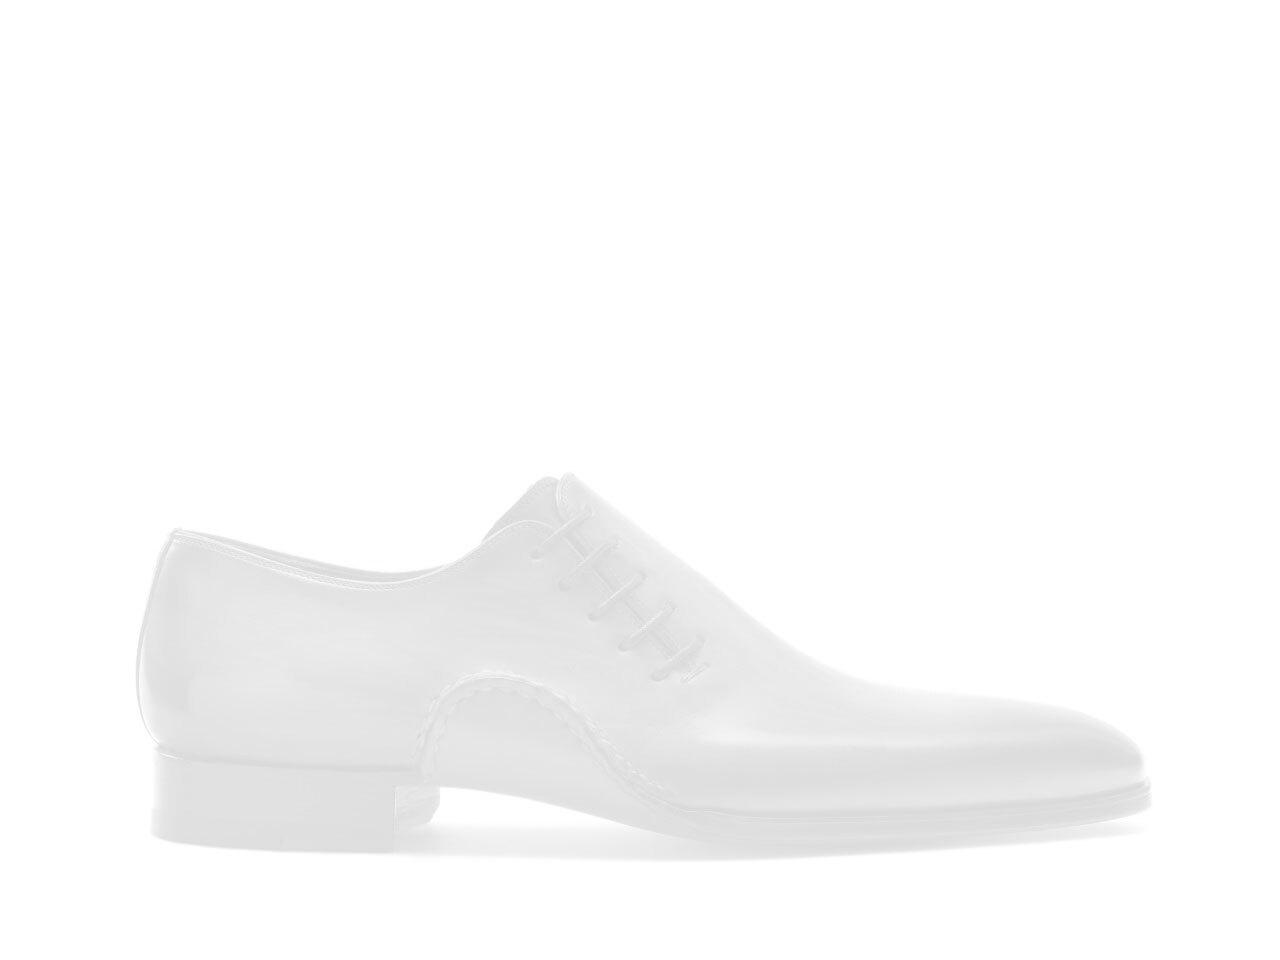 Sole of the Magnanni Magnanni X Pelotonia Men's Sneakers